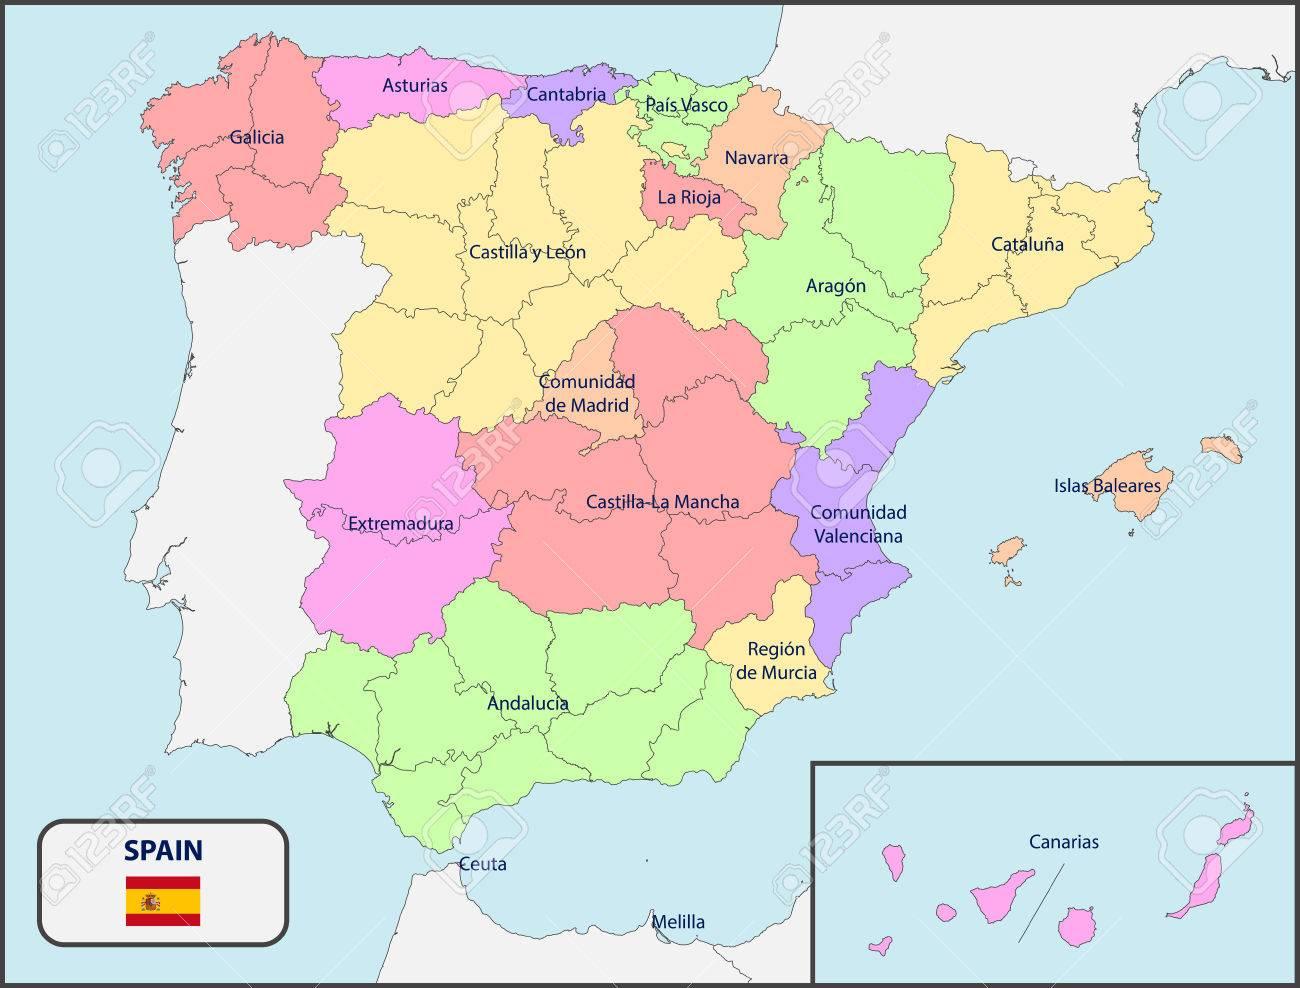 Map Of Spain Political.Political Map Of Spain With Names